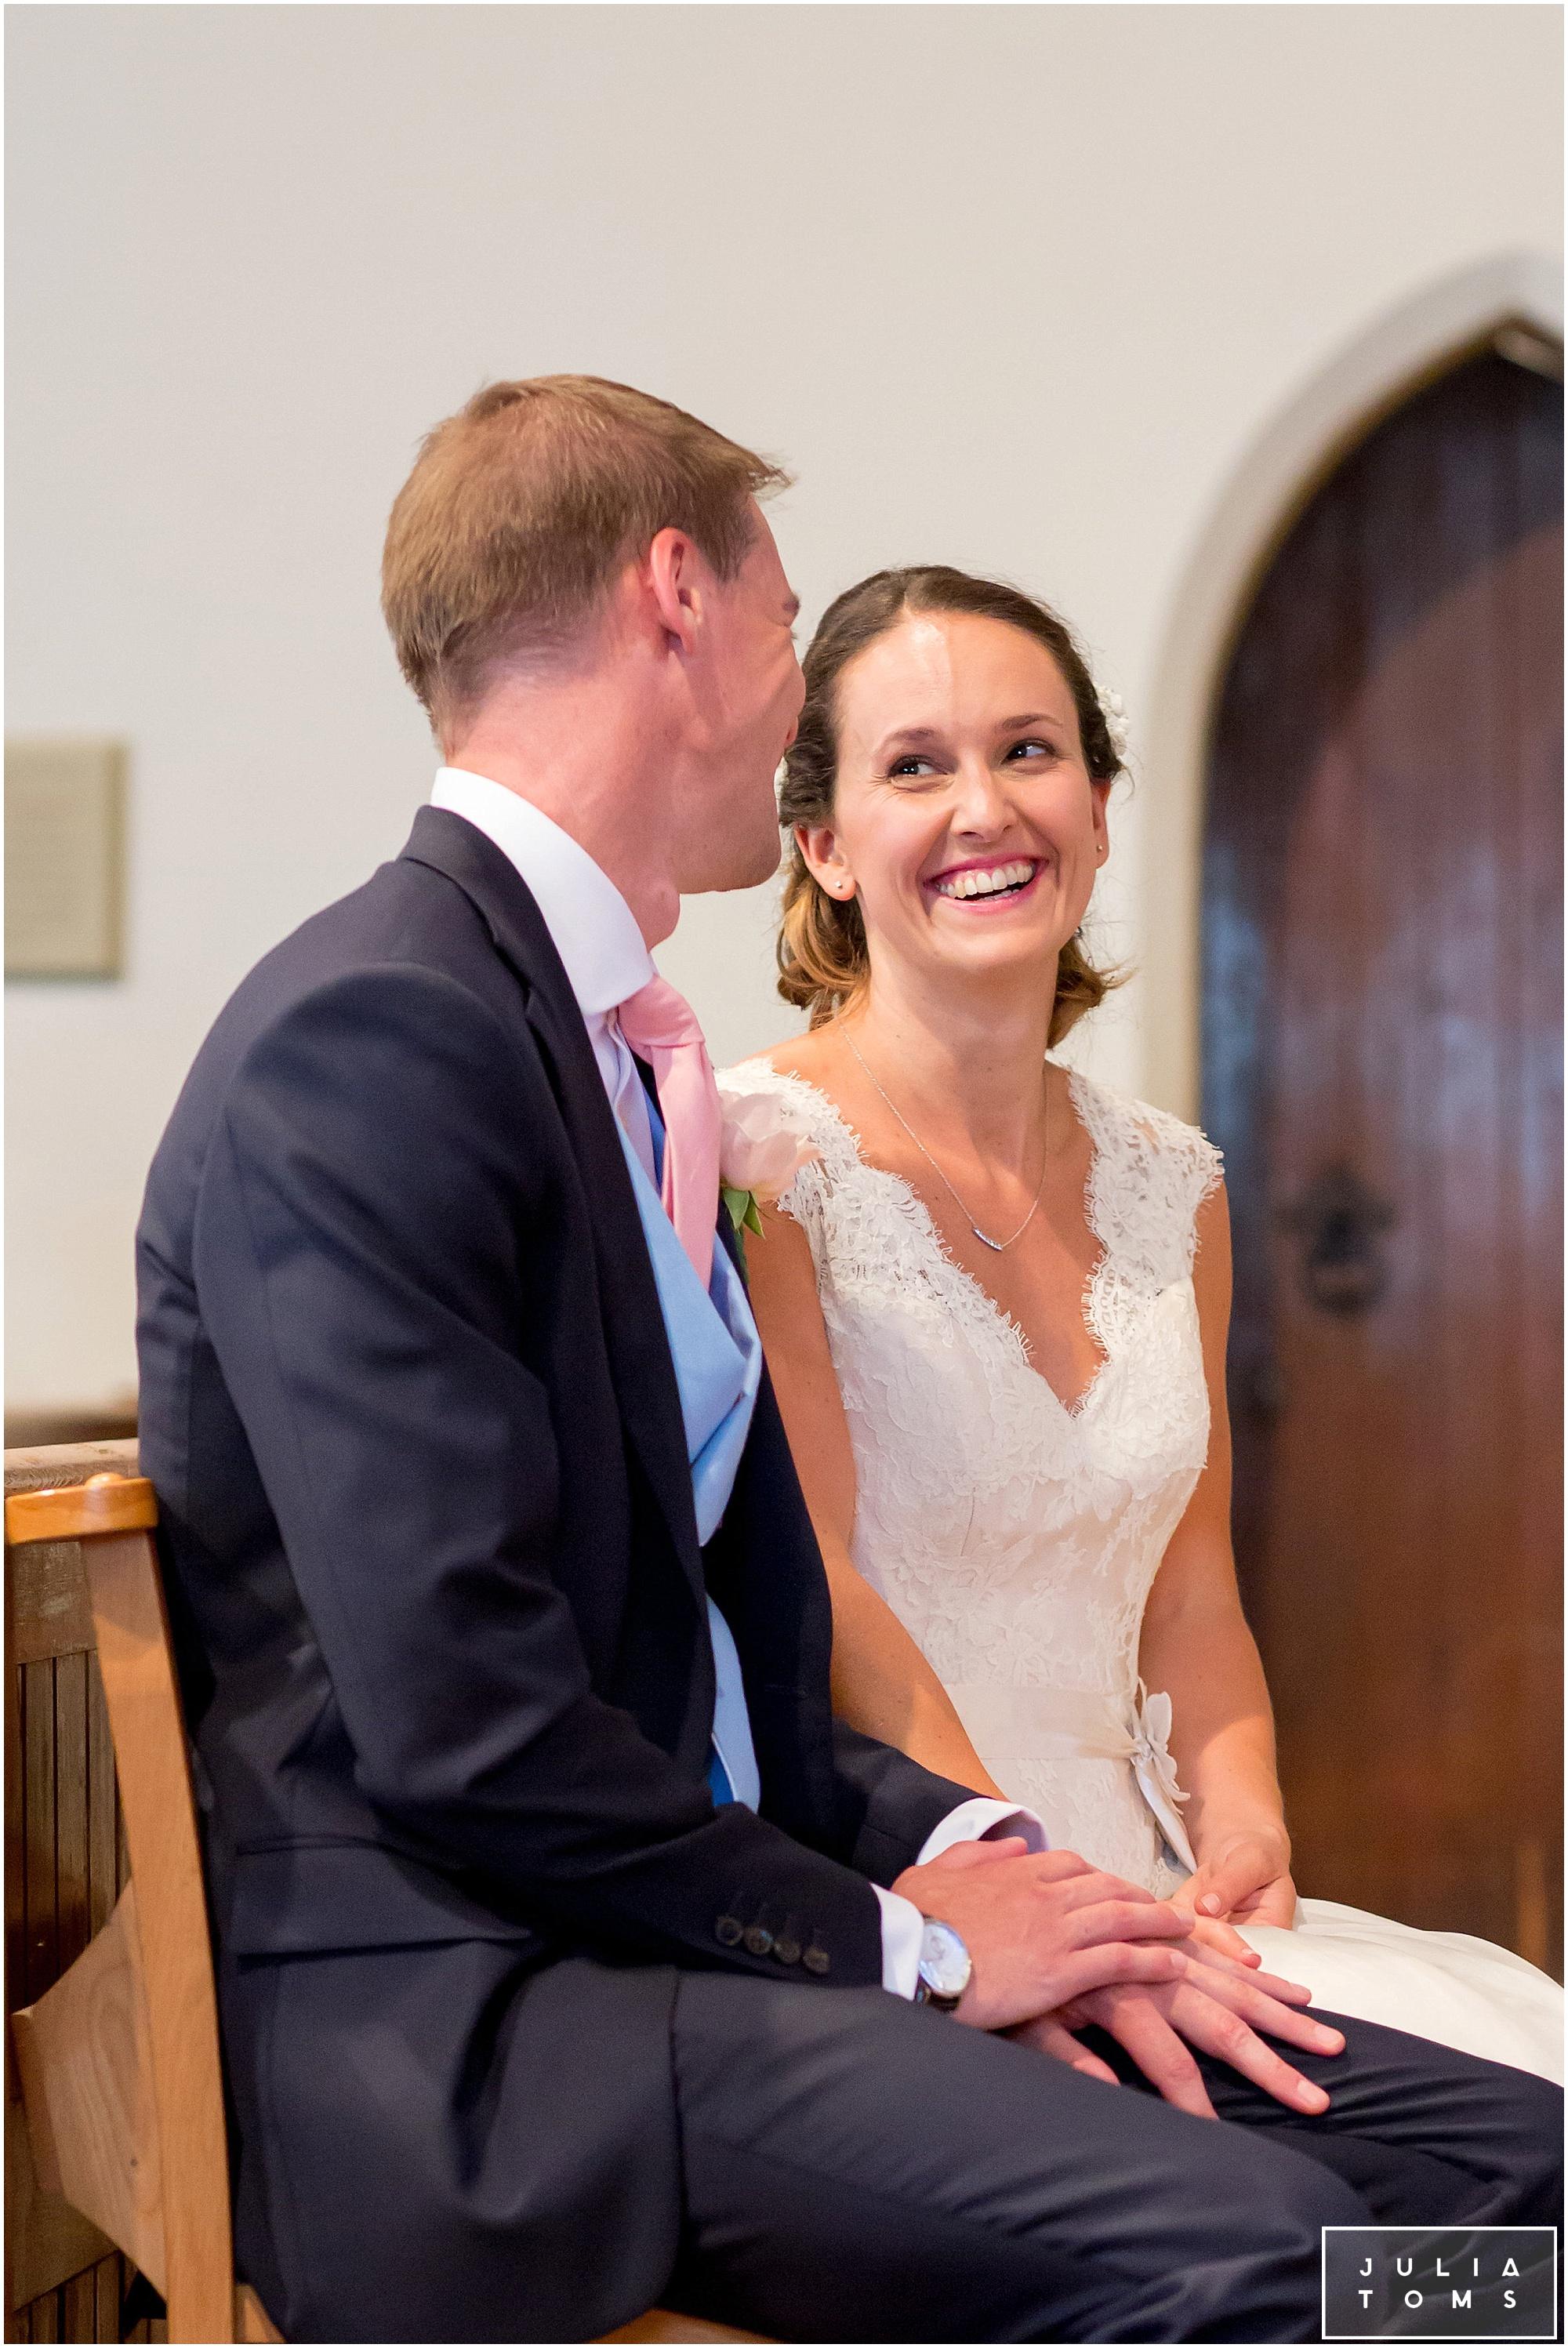 julia_toms_chichester_wedding_photographer_portsmouth_025.jpg